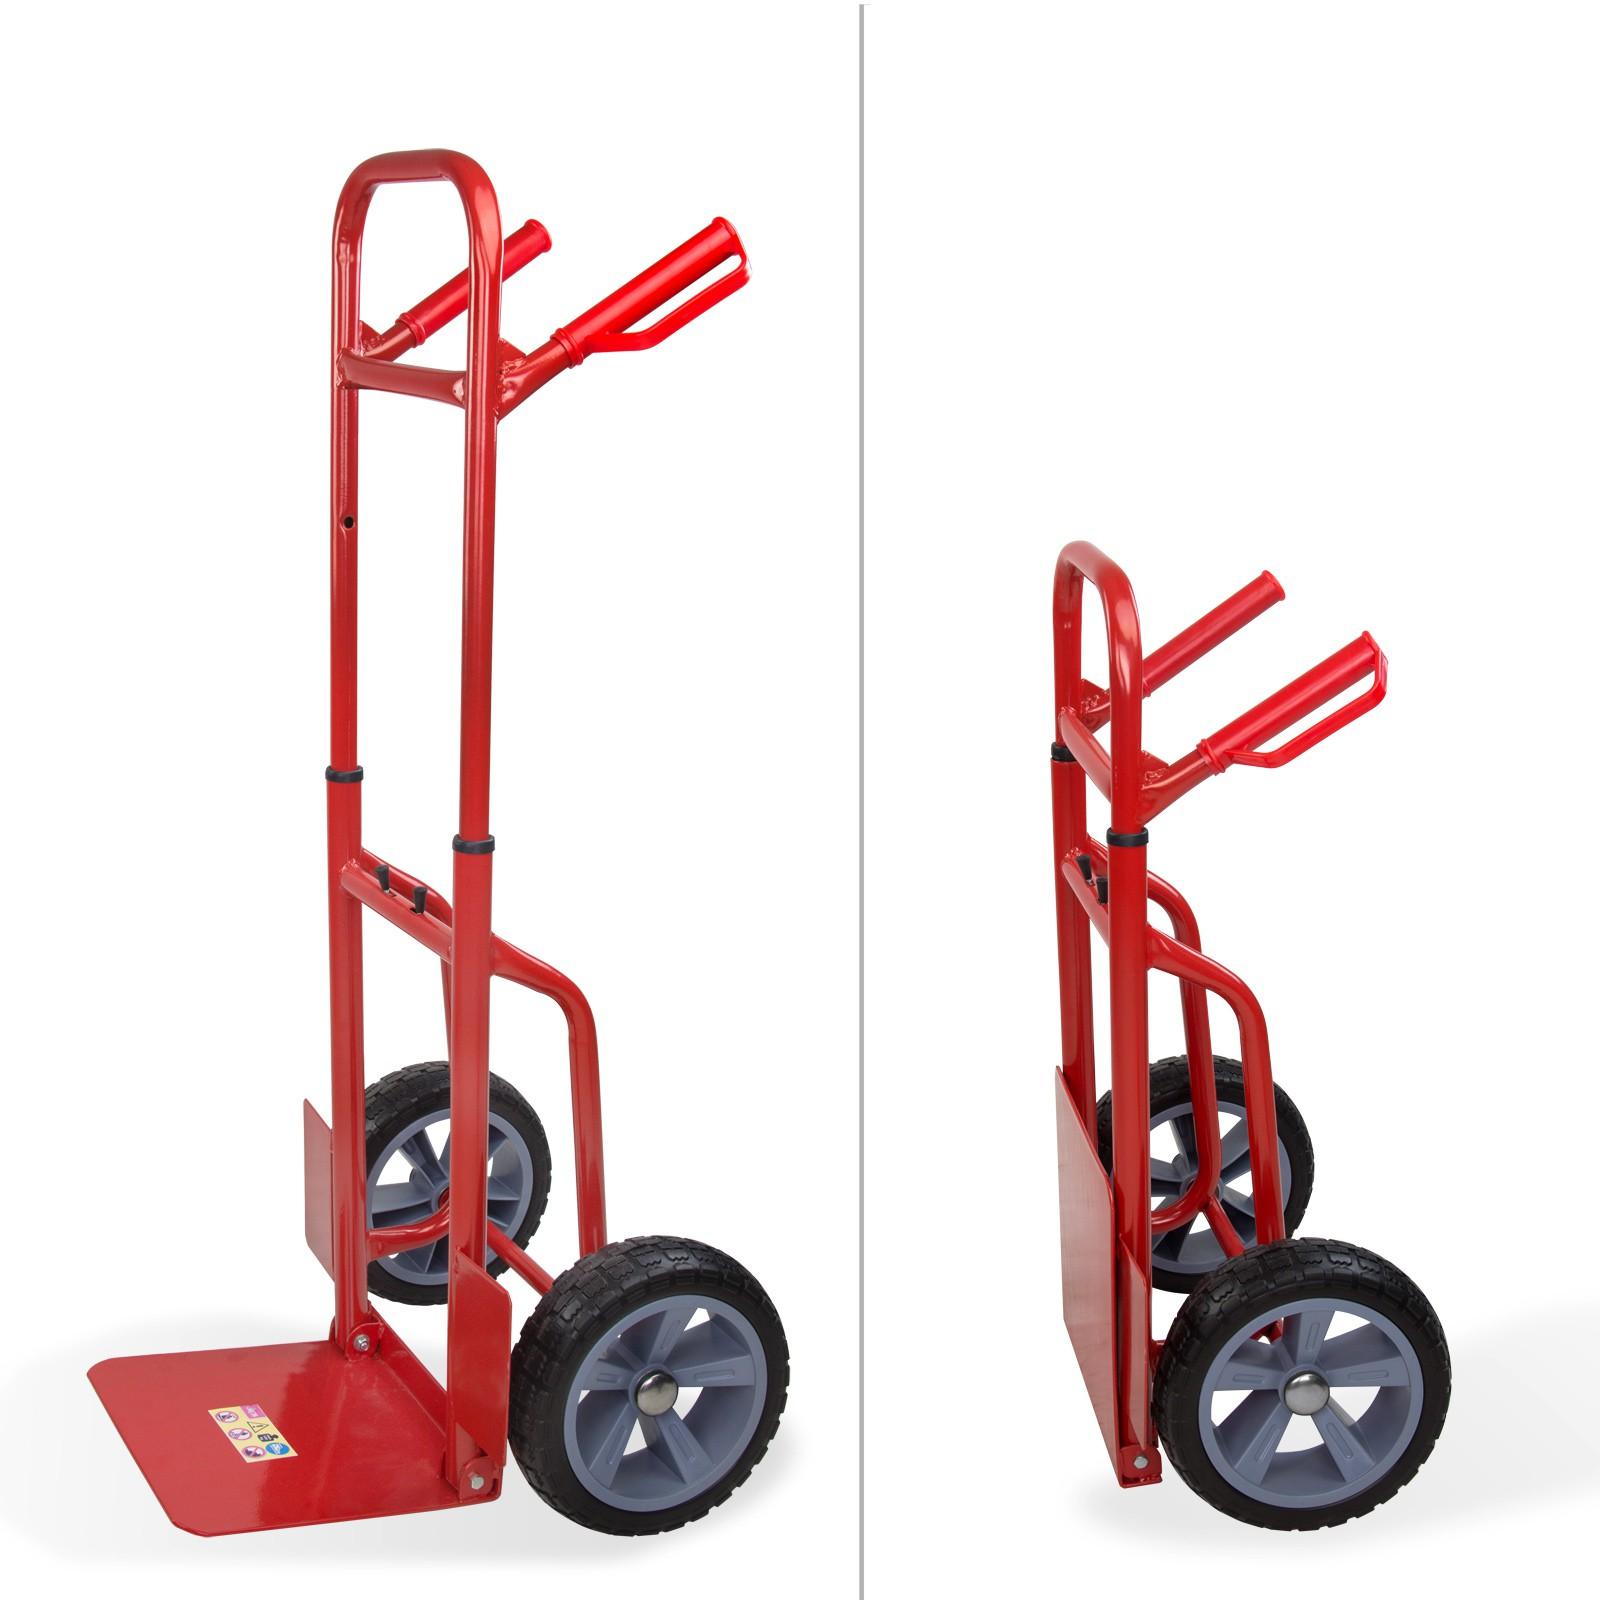 Dema Sackkarre Transportkarre Stapelkarre Karre bis 120 kg klappbar Vollgummireifen 19901